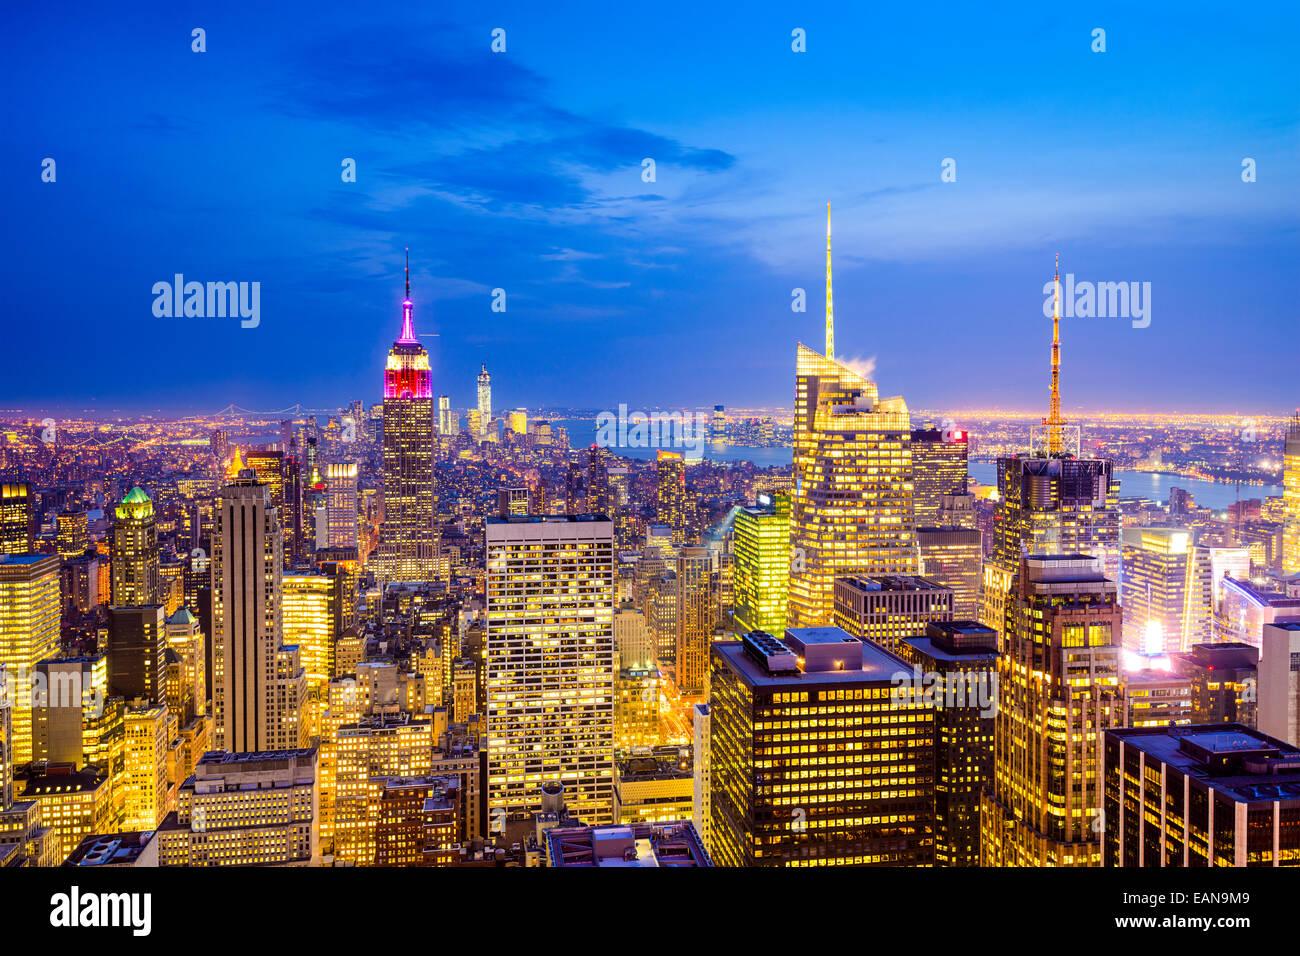 New York City, USA city skyline of midtown Manhattan. - Stock Image